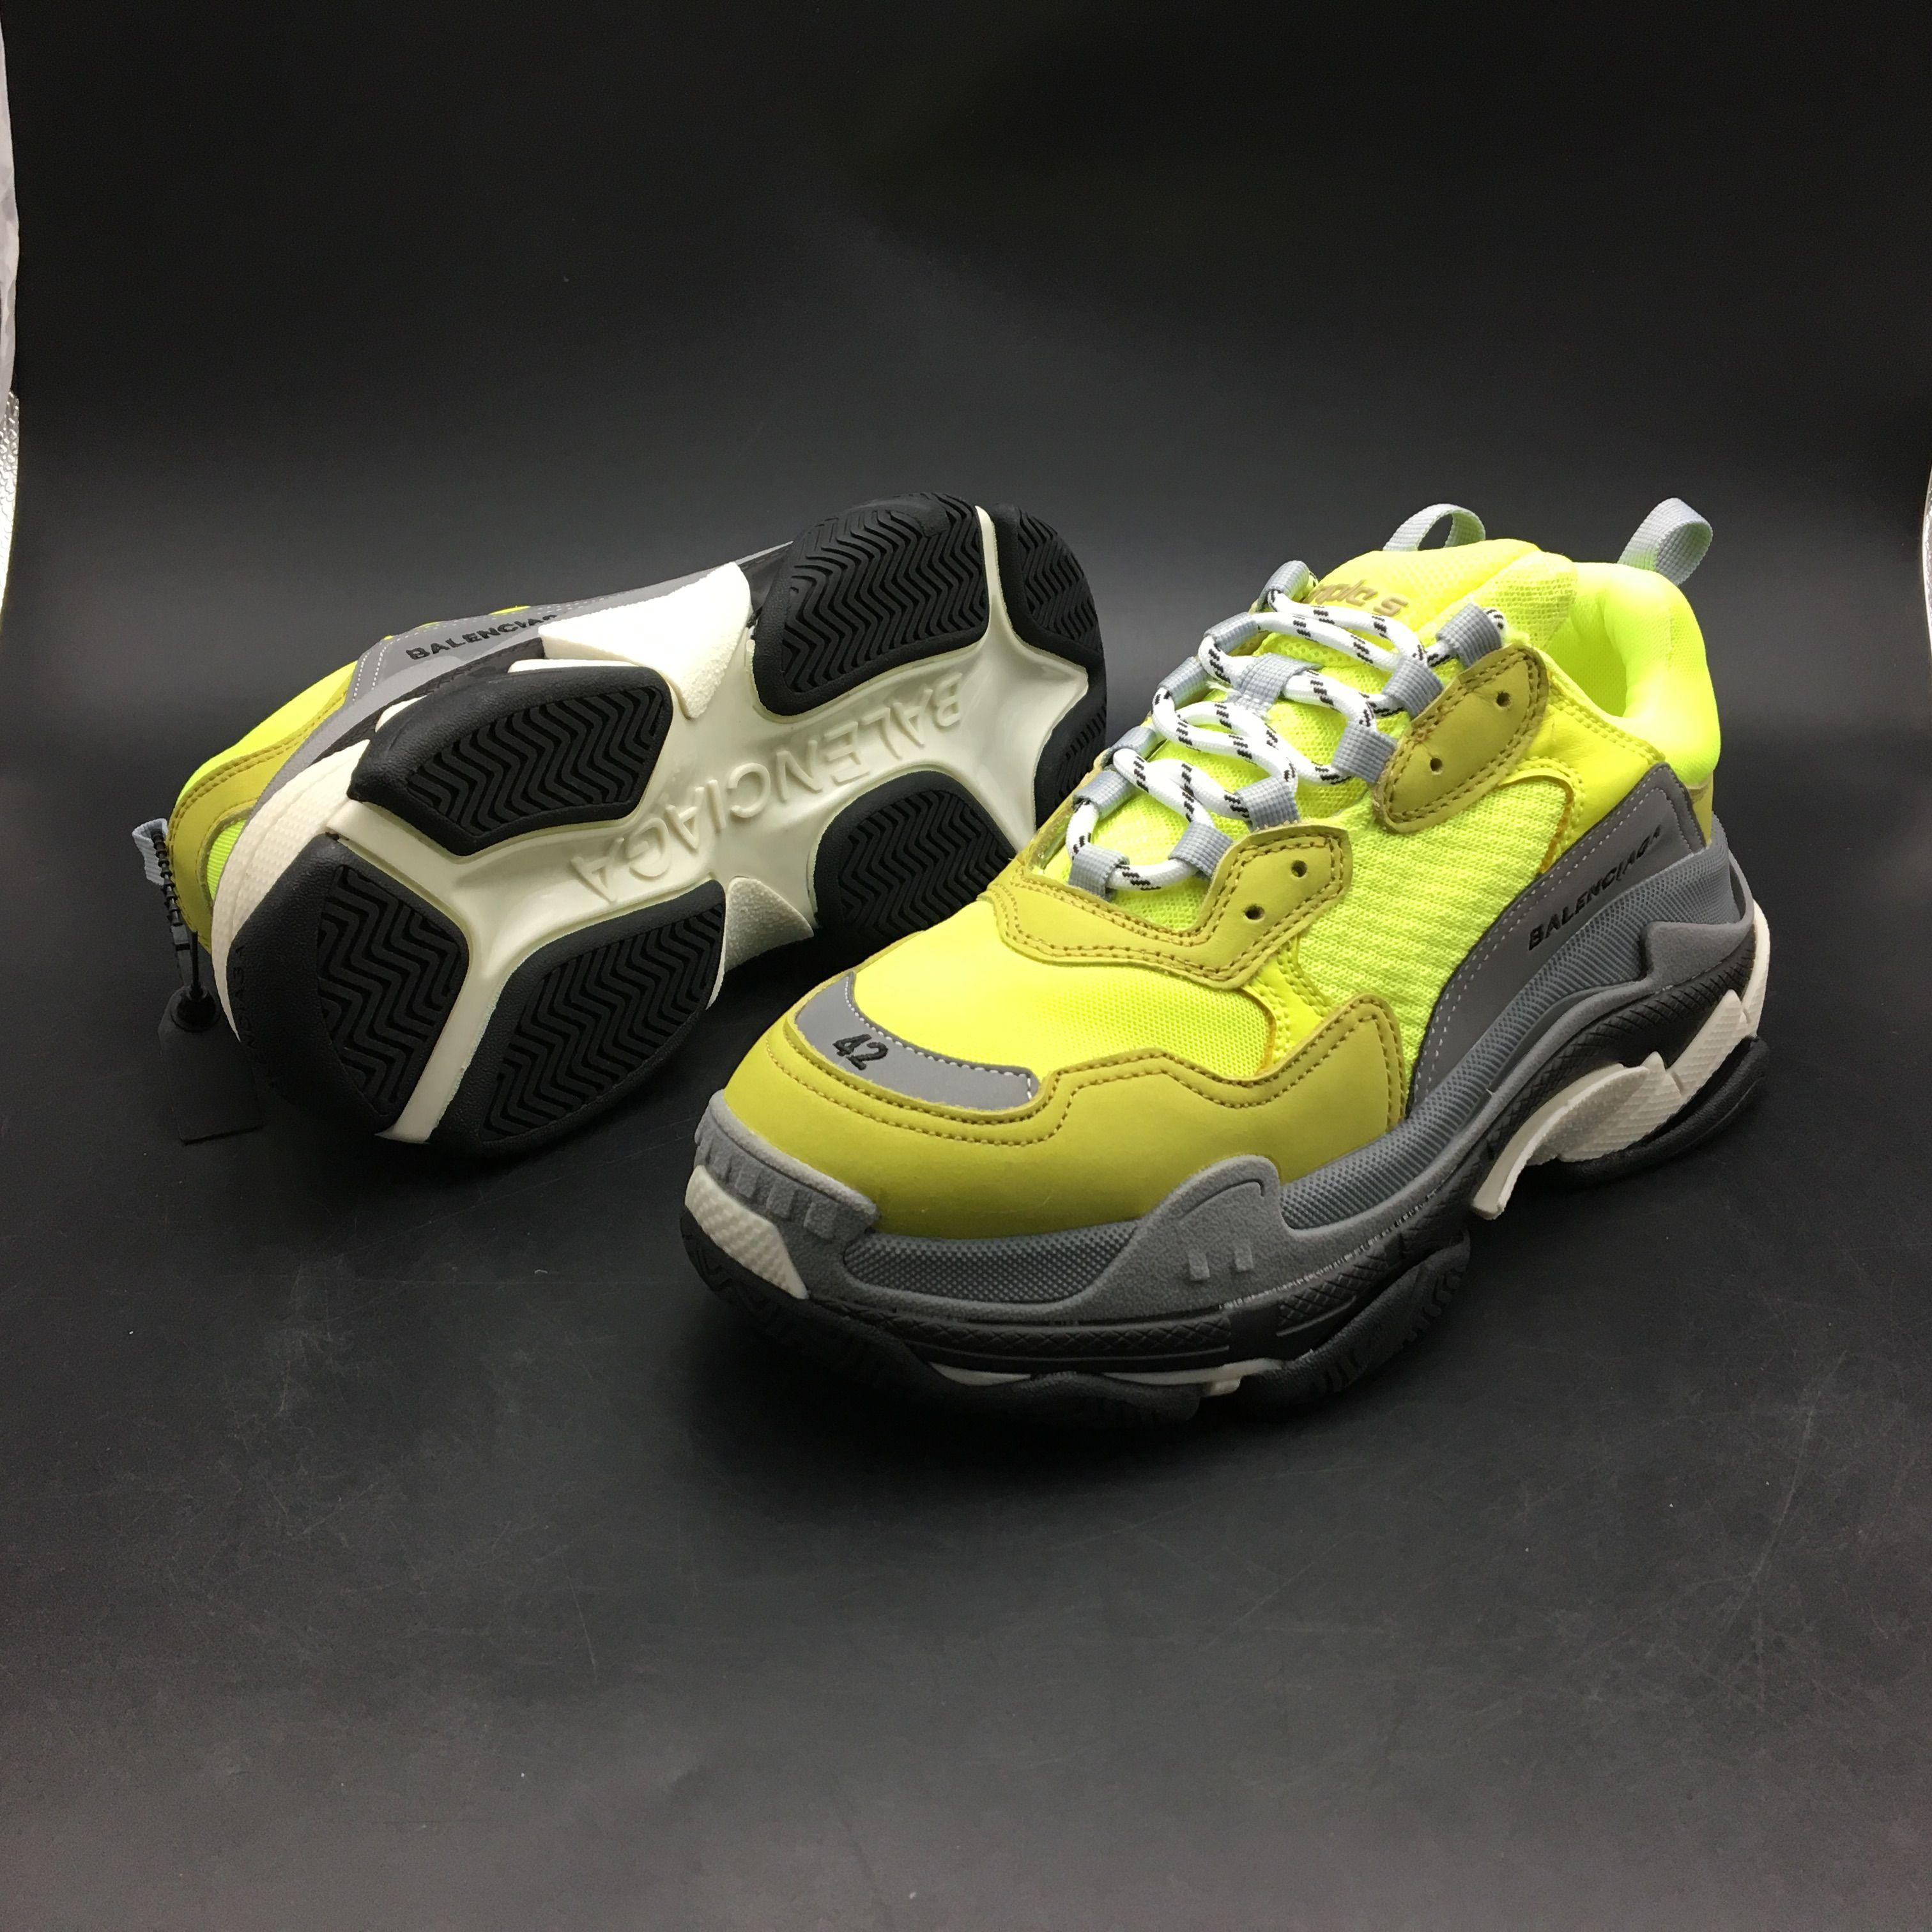 1b7b0decf BALENCIAGA WMS Sneakers Triple S Neon Yellow 512175W09O47320 –  www.hookicks.com